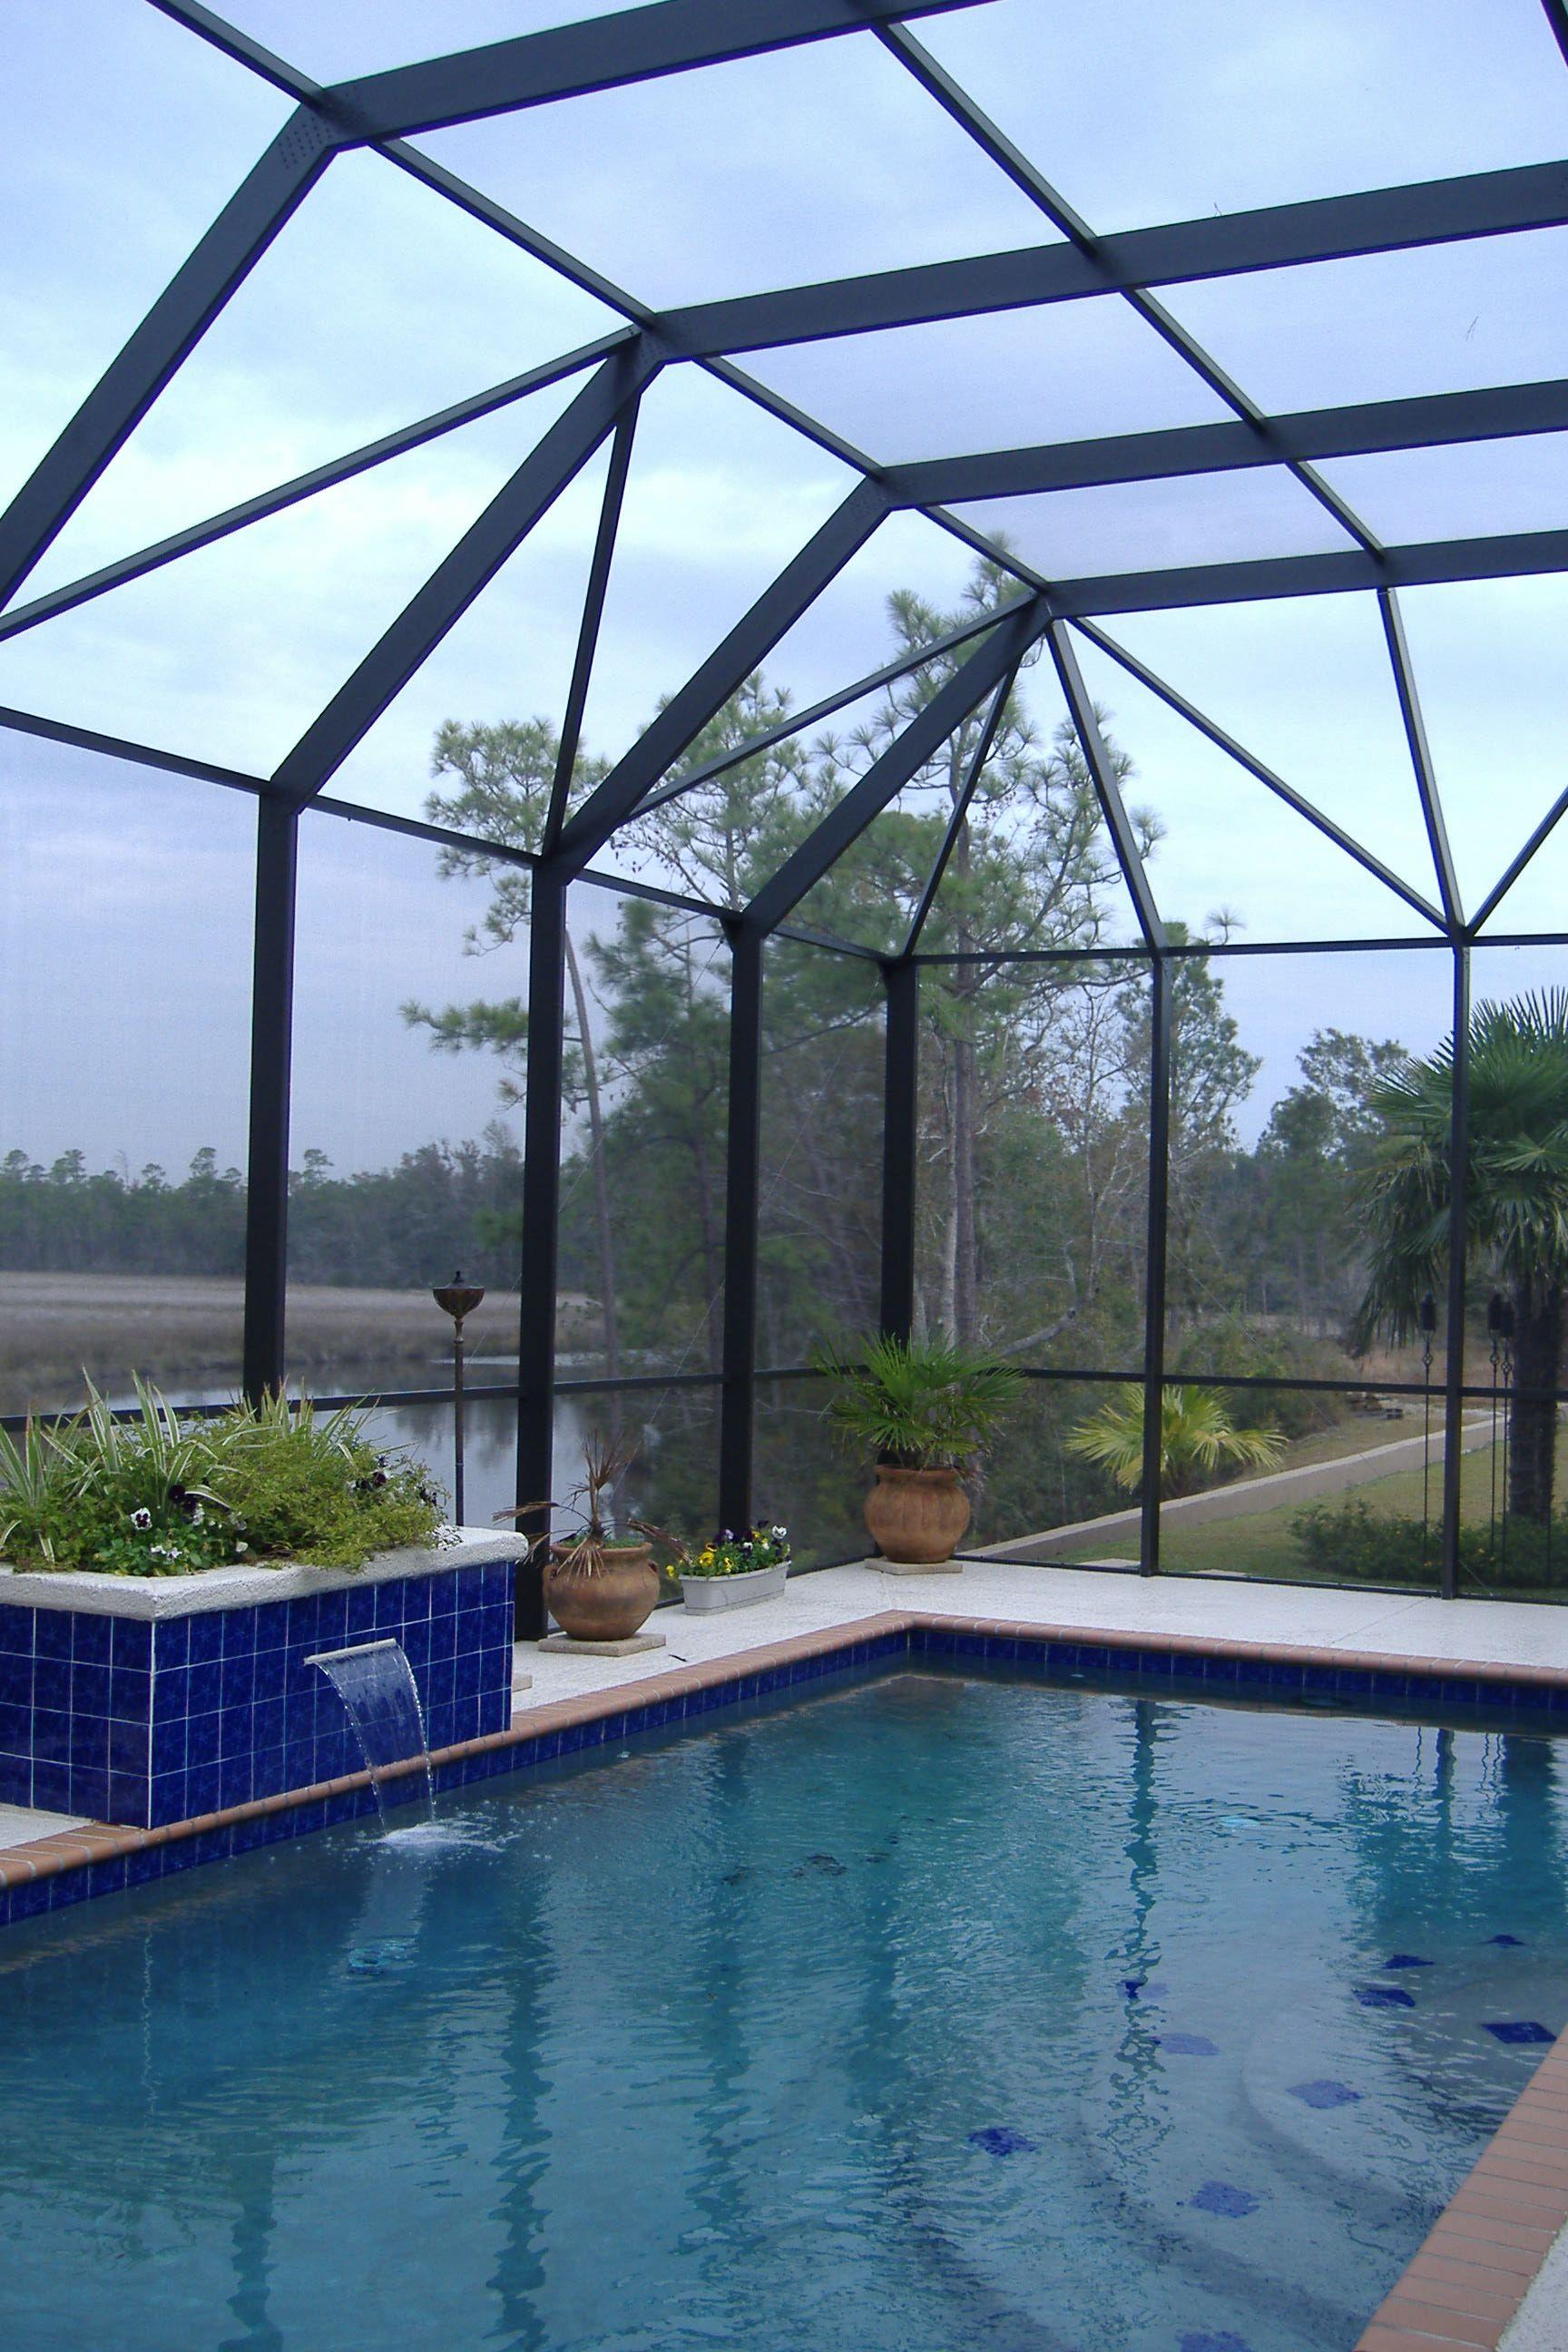 Bronze Frame Mansard Style Roof Overlooks The Bayou In Gautier,